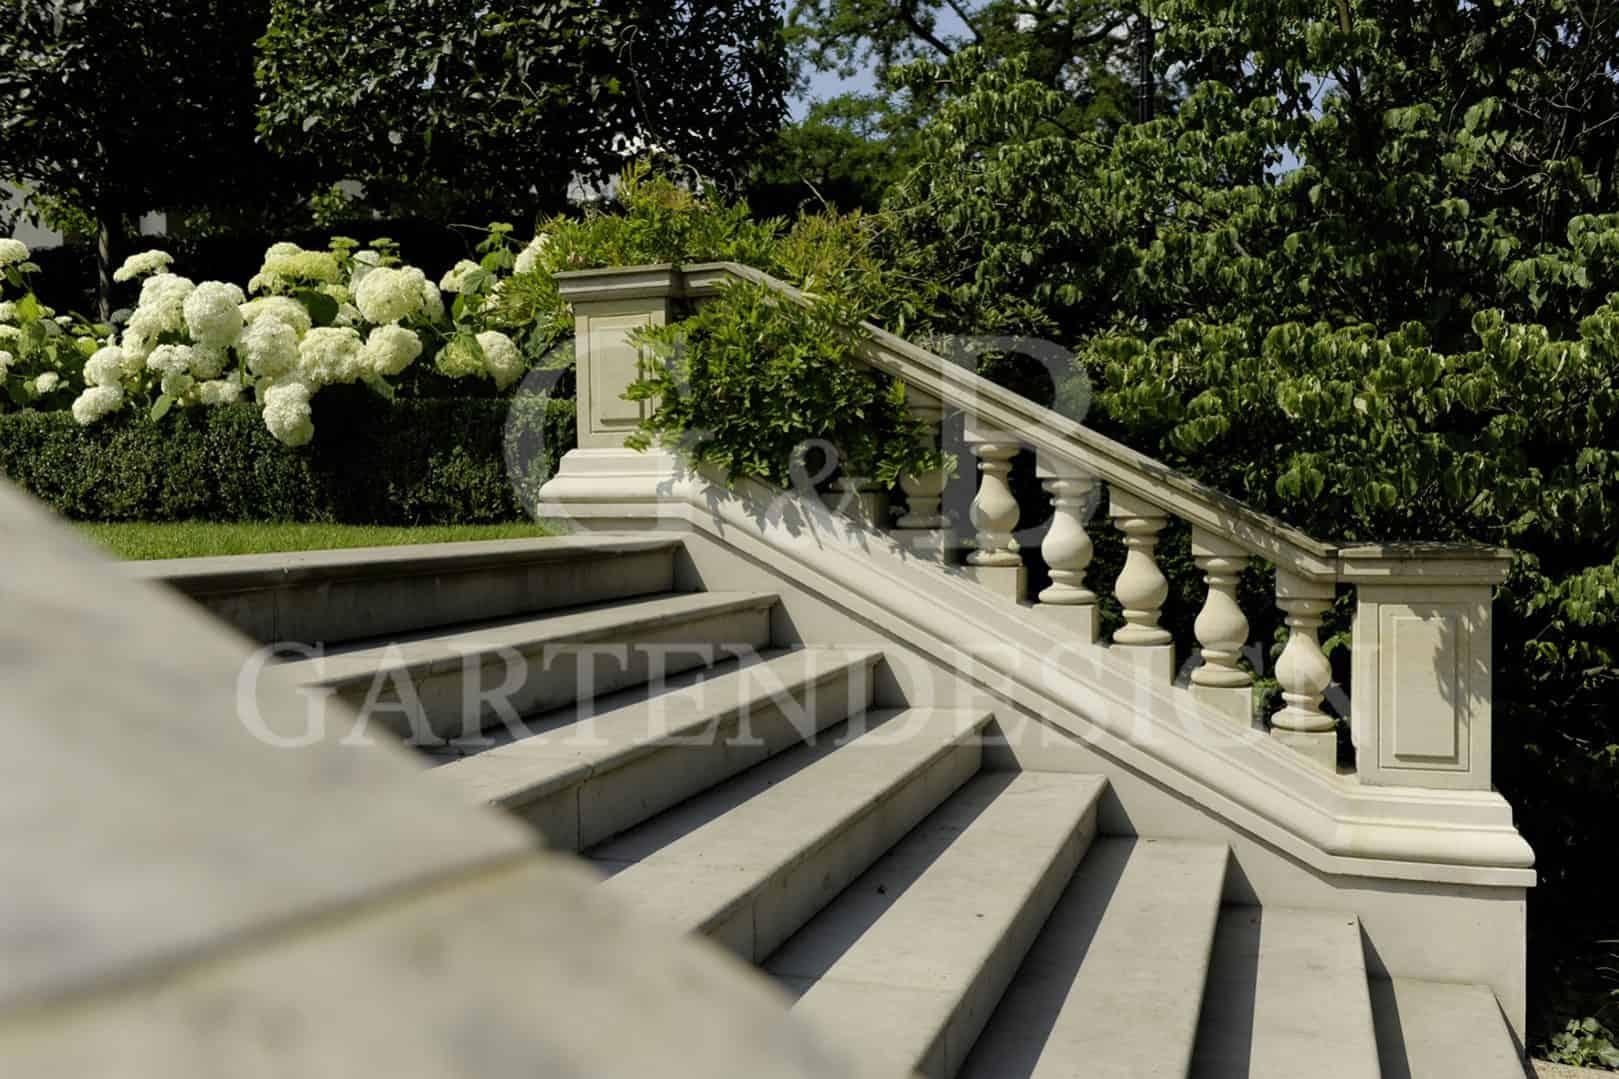 gempp gartendesign | gartengestaltung | landschaftsarchitektur, Garten ideen